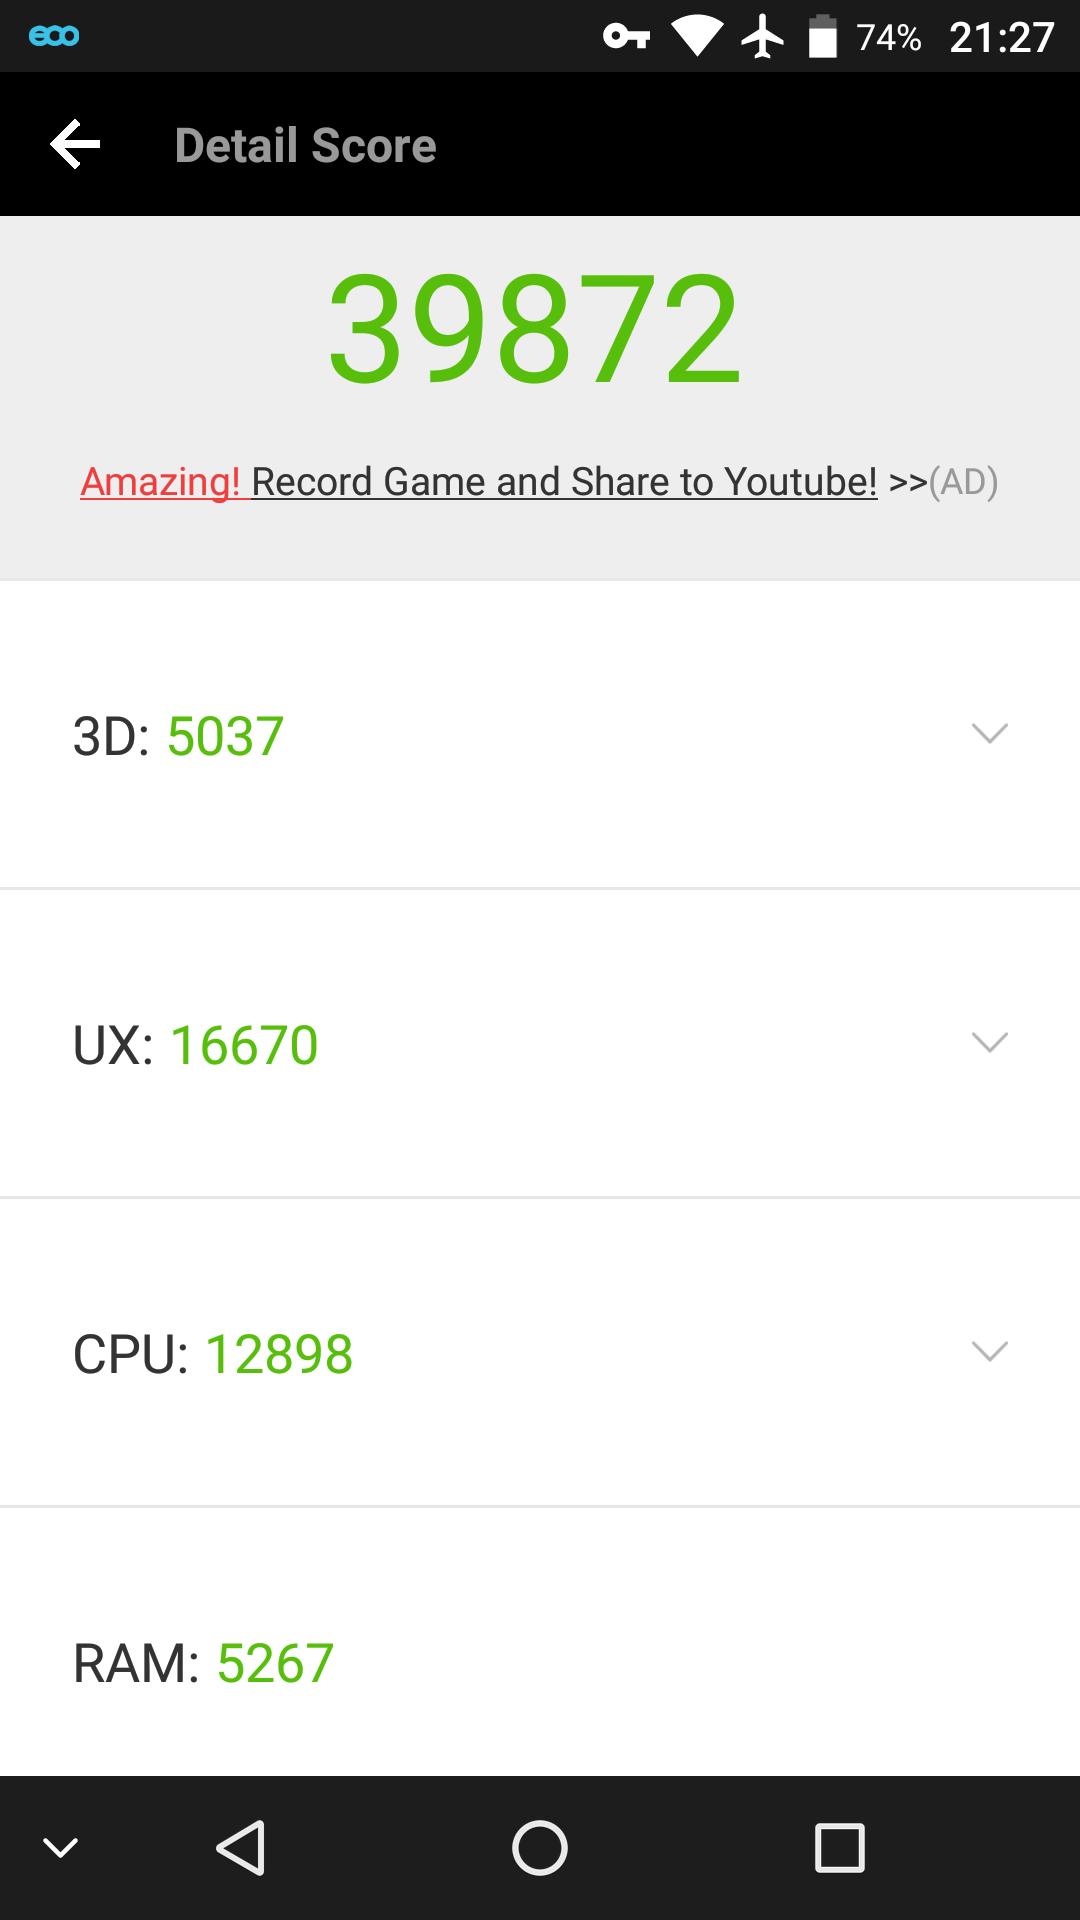 Screenshot_20171228-212719.png